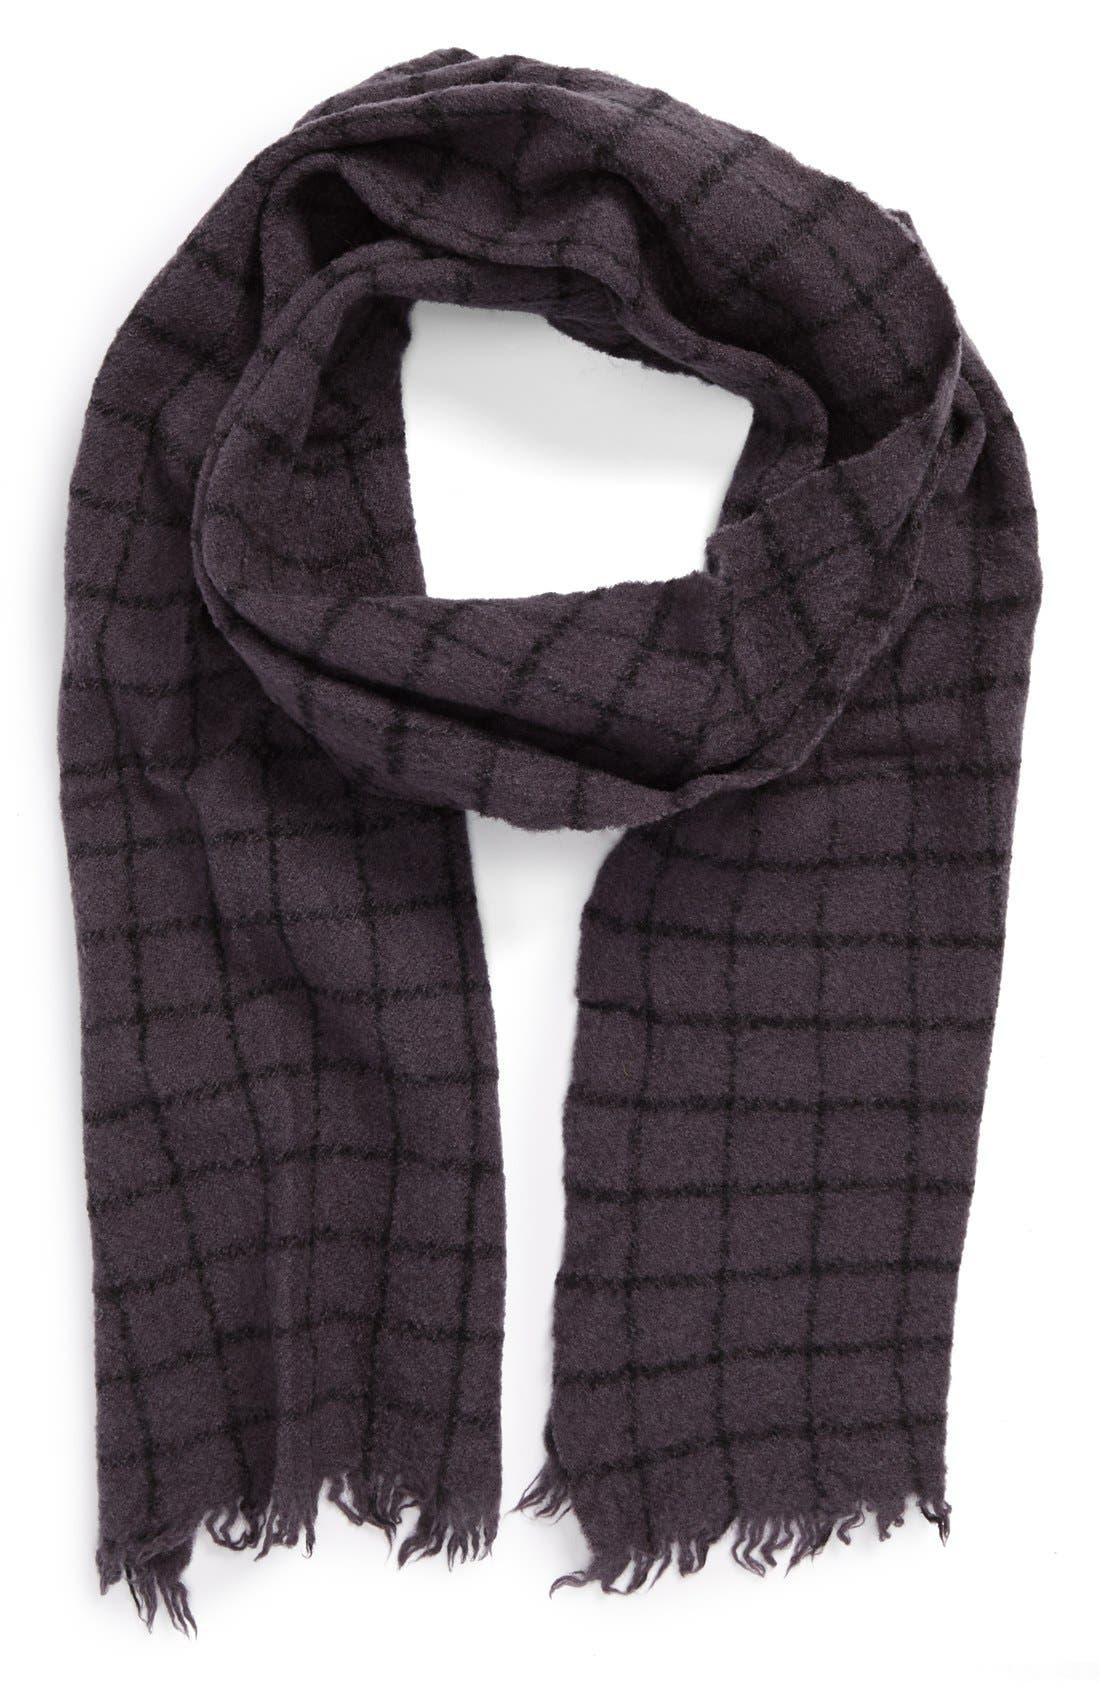 TOPMAN,                             Grid Wool Knit Scarf,                             Main thumbnail 1, color,                             021